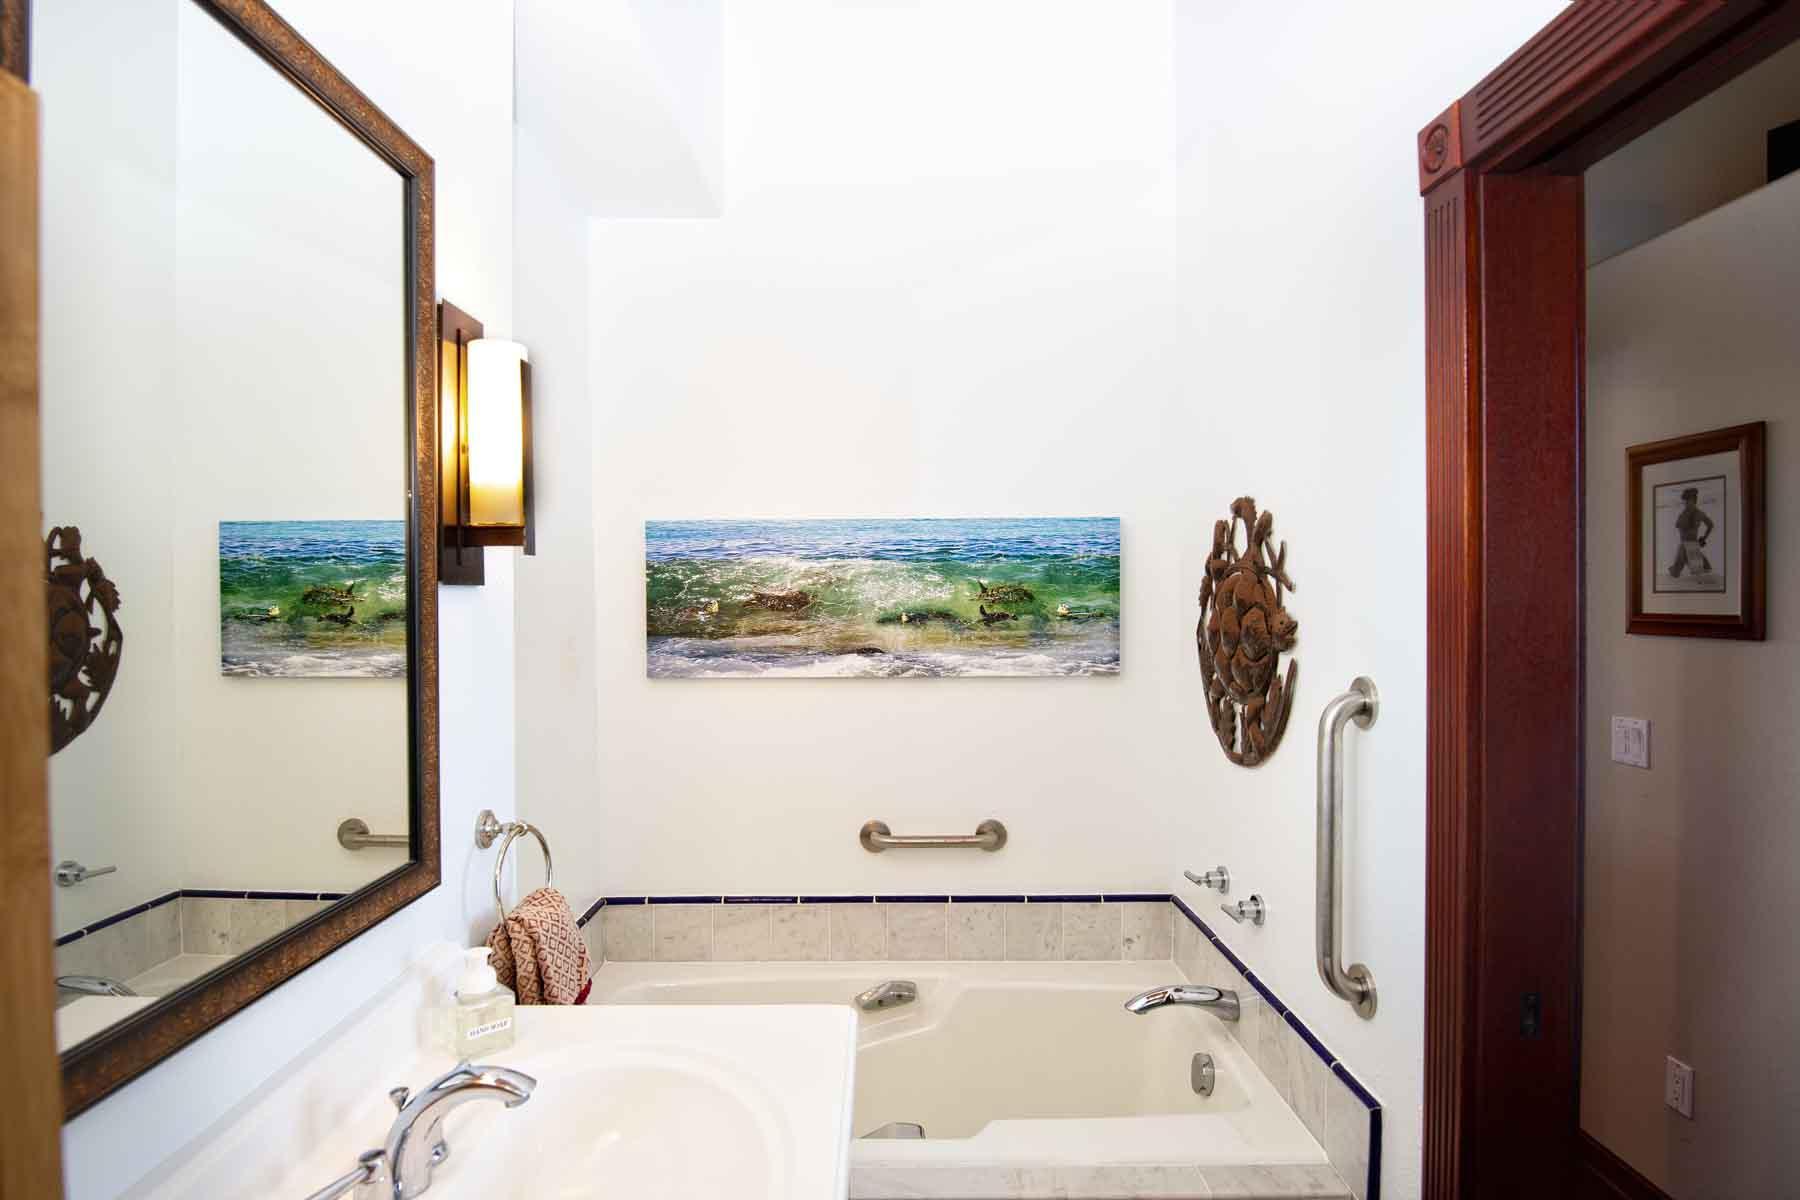 Right half of Master bathroom with soaking tub.